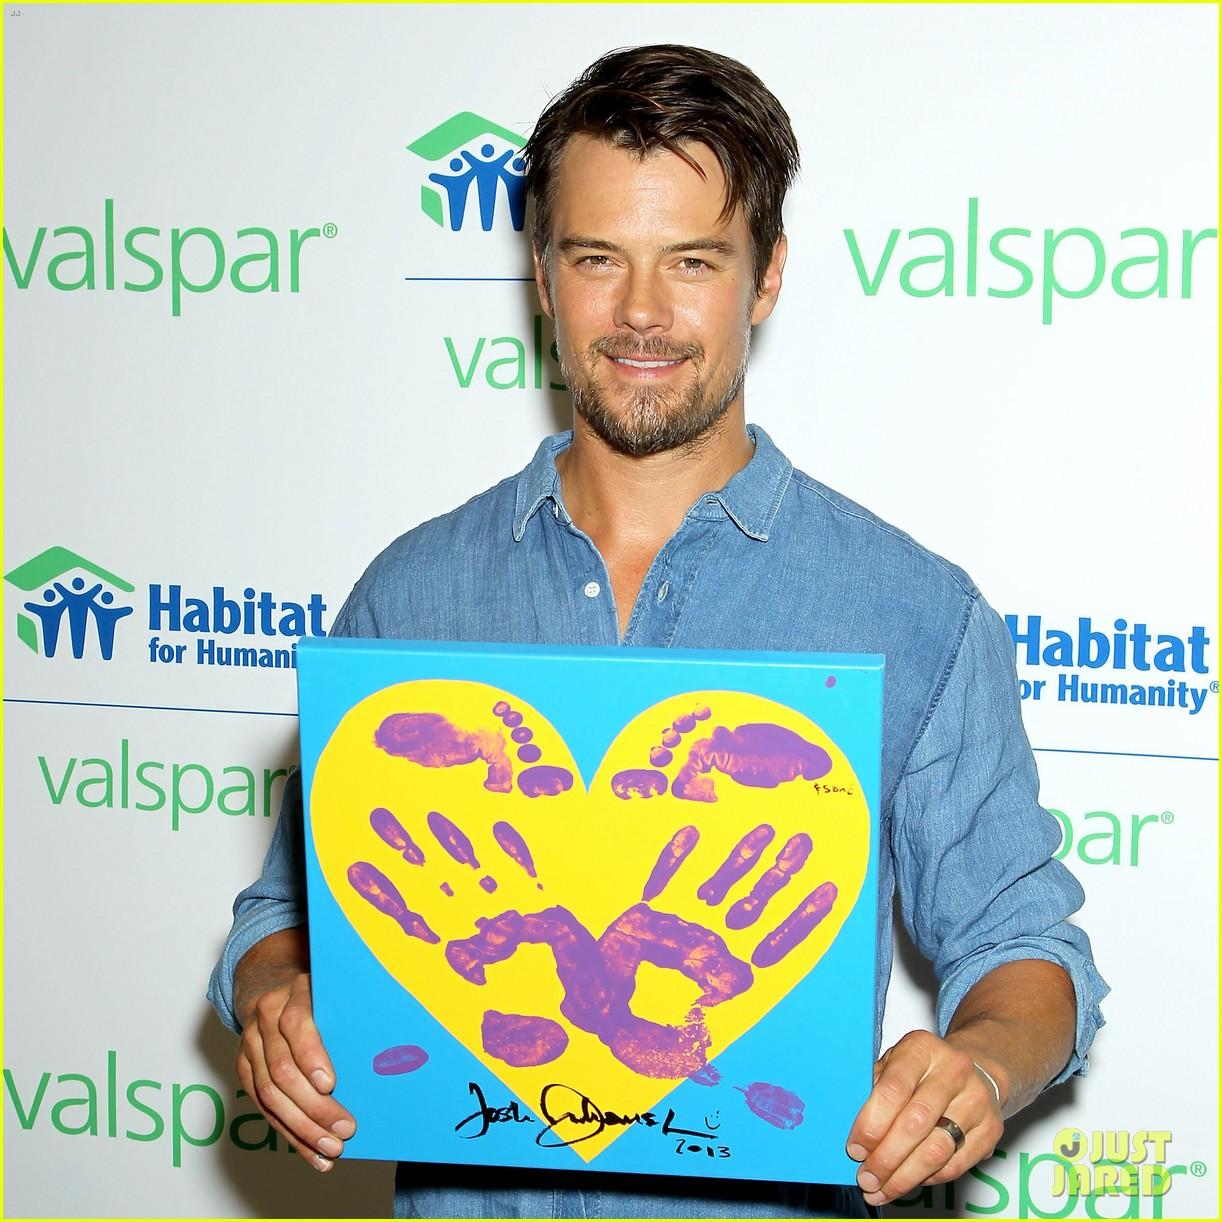 josh duhamel lends a helping hand at valspar charity event 04